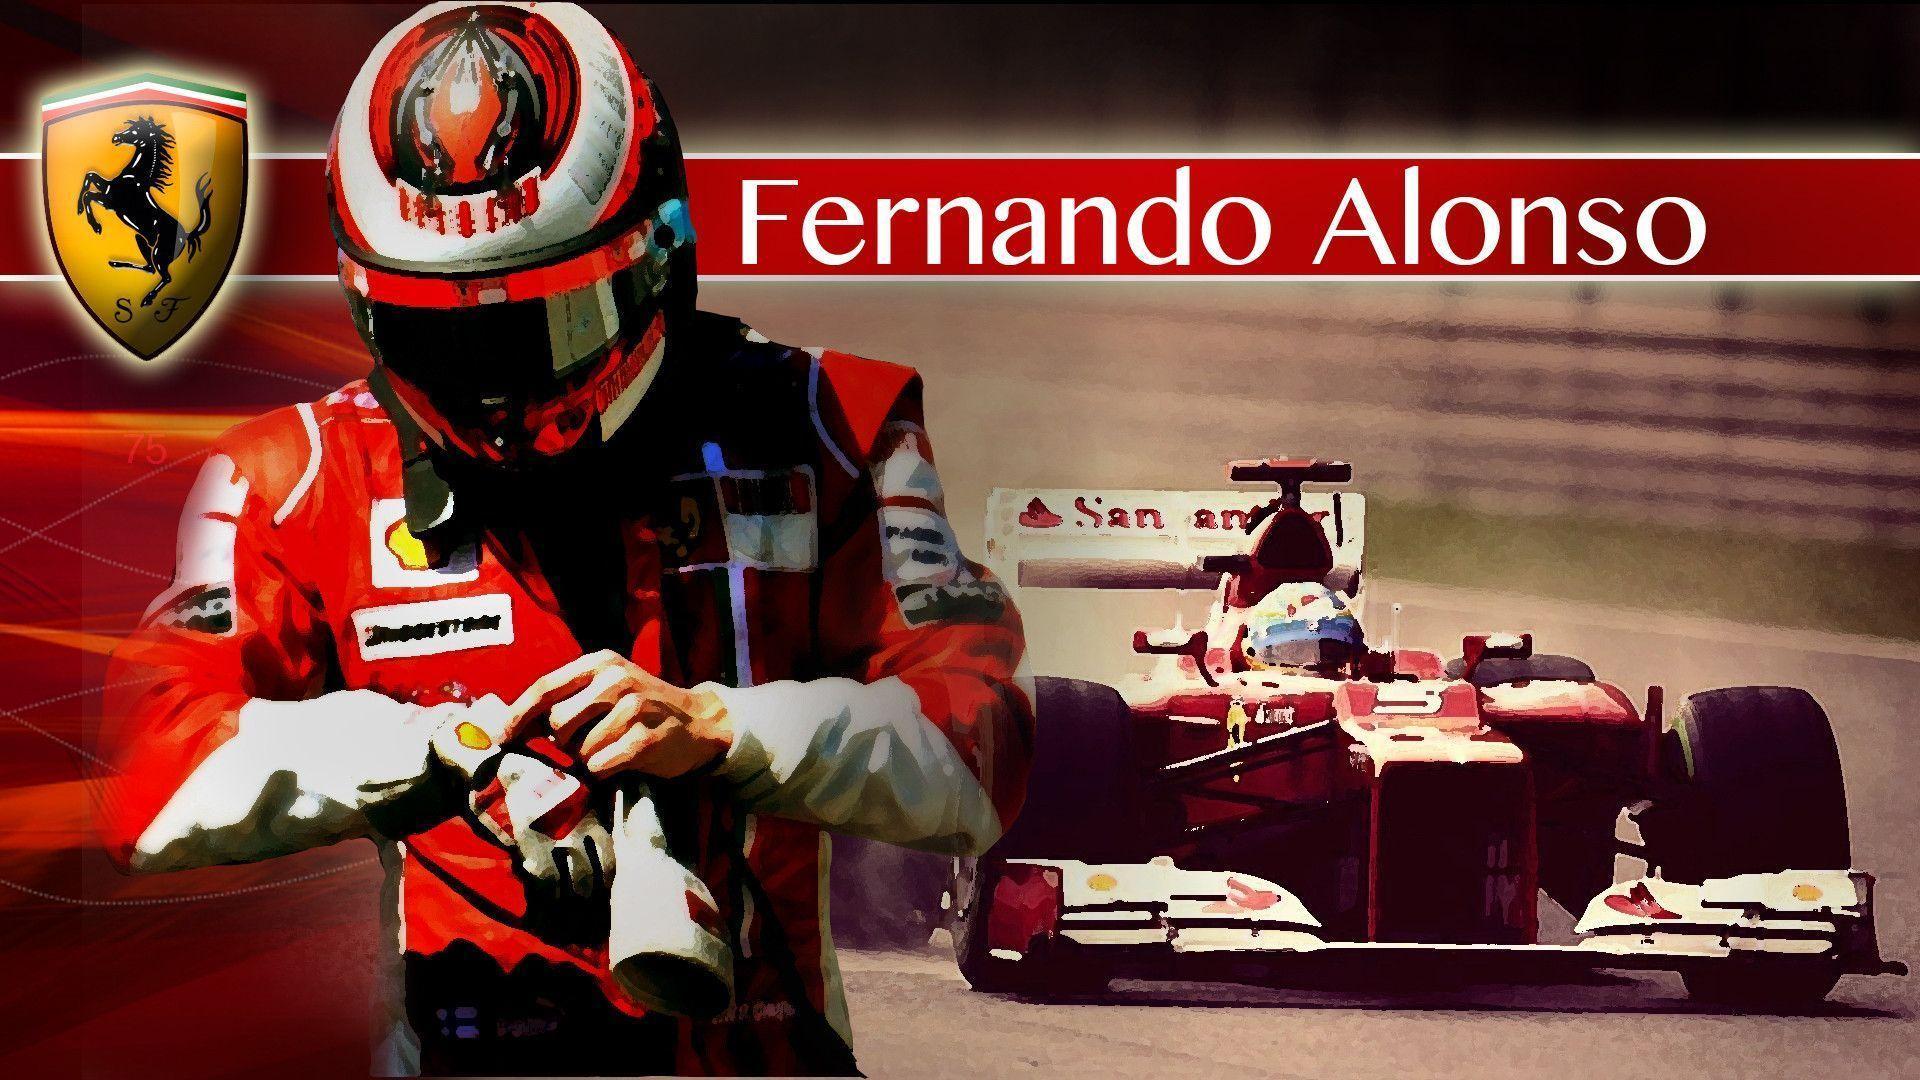 Fernando Alonso Wallpapers 1920x1080